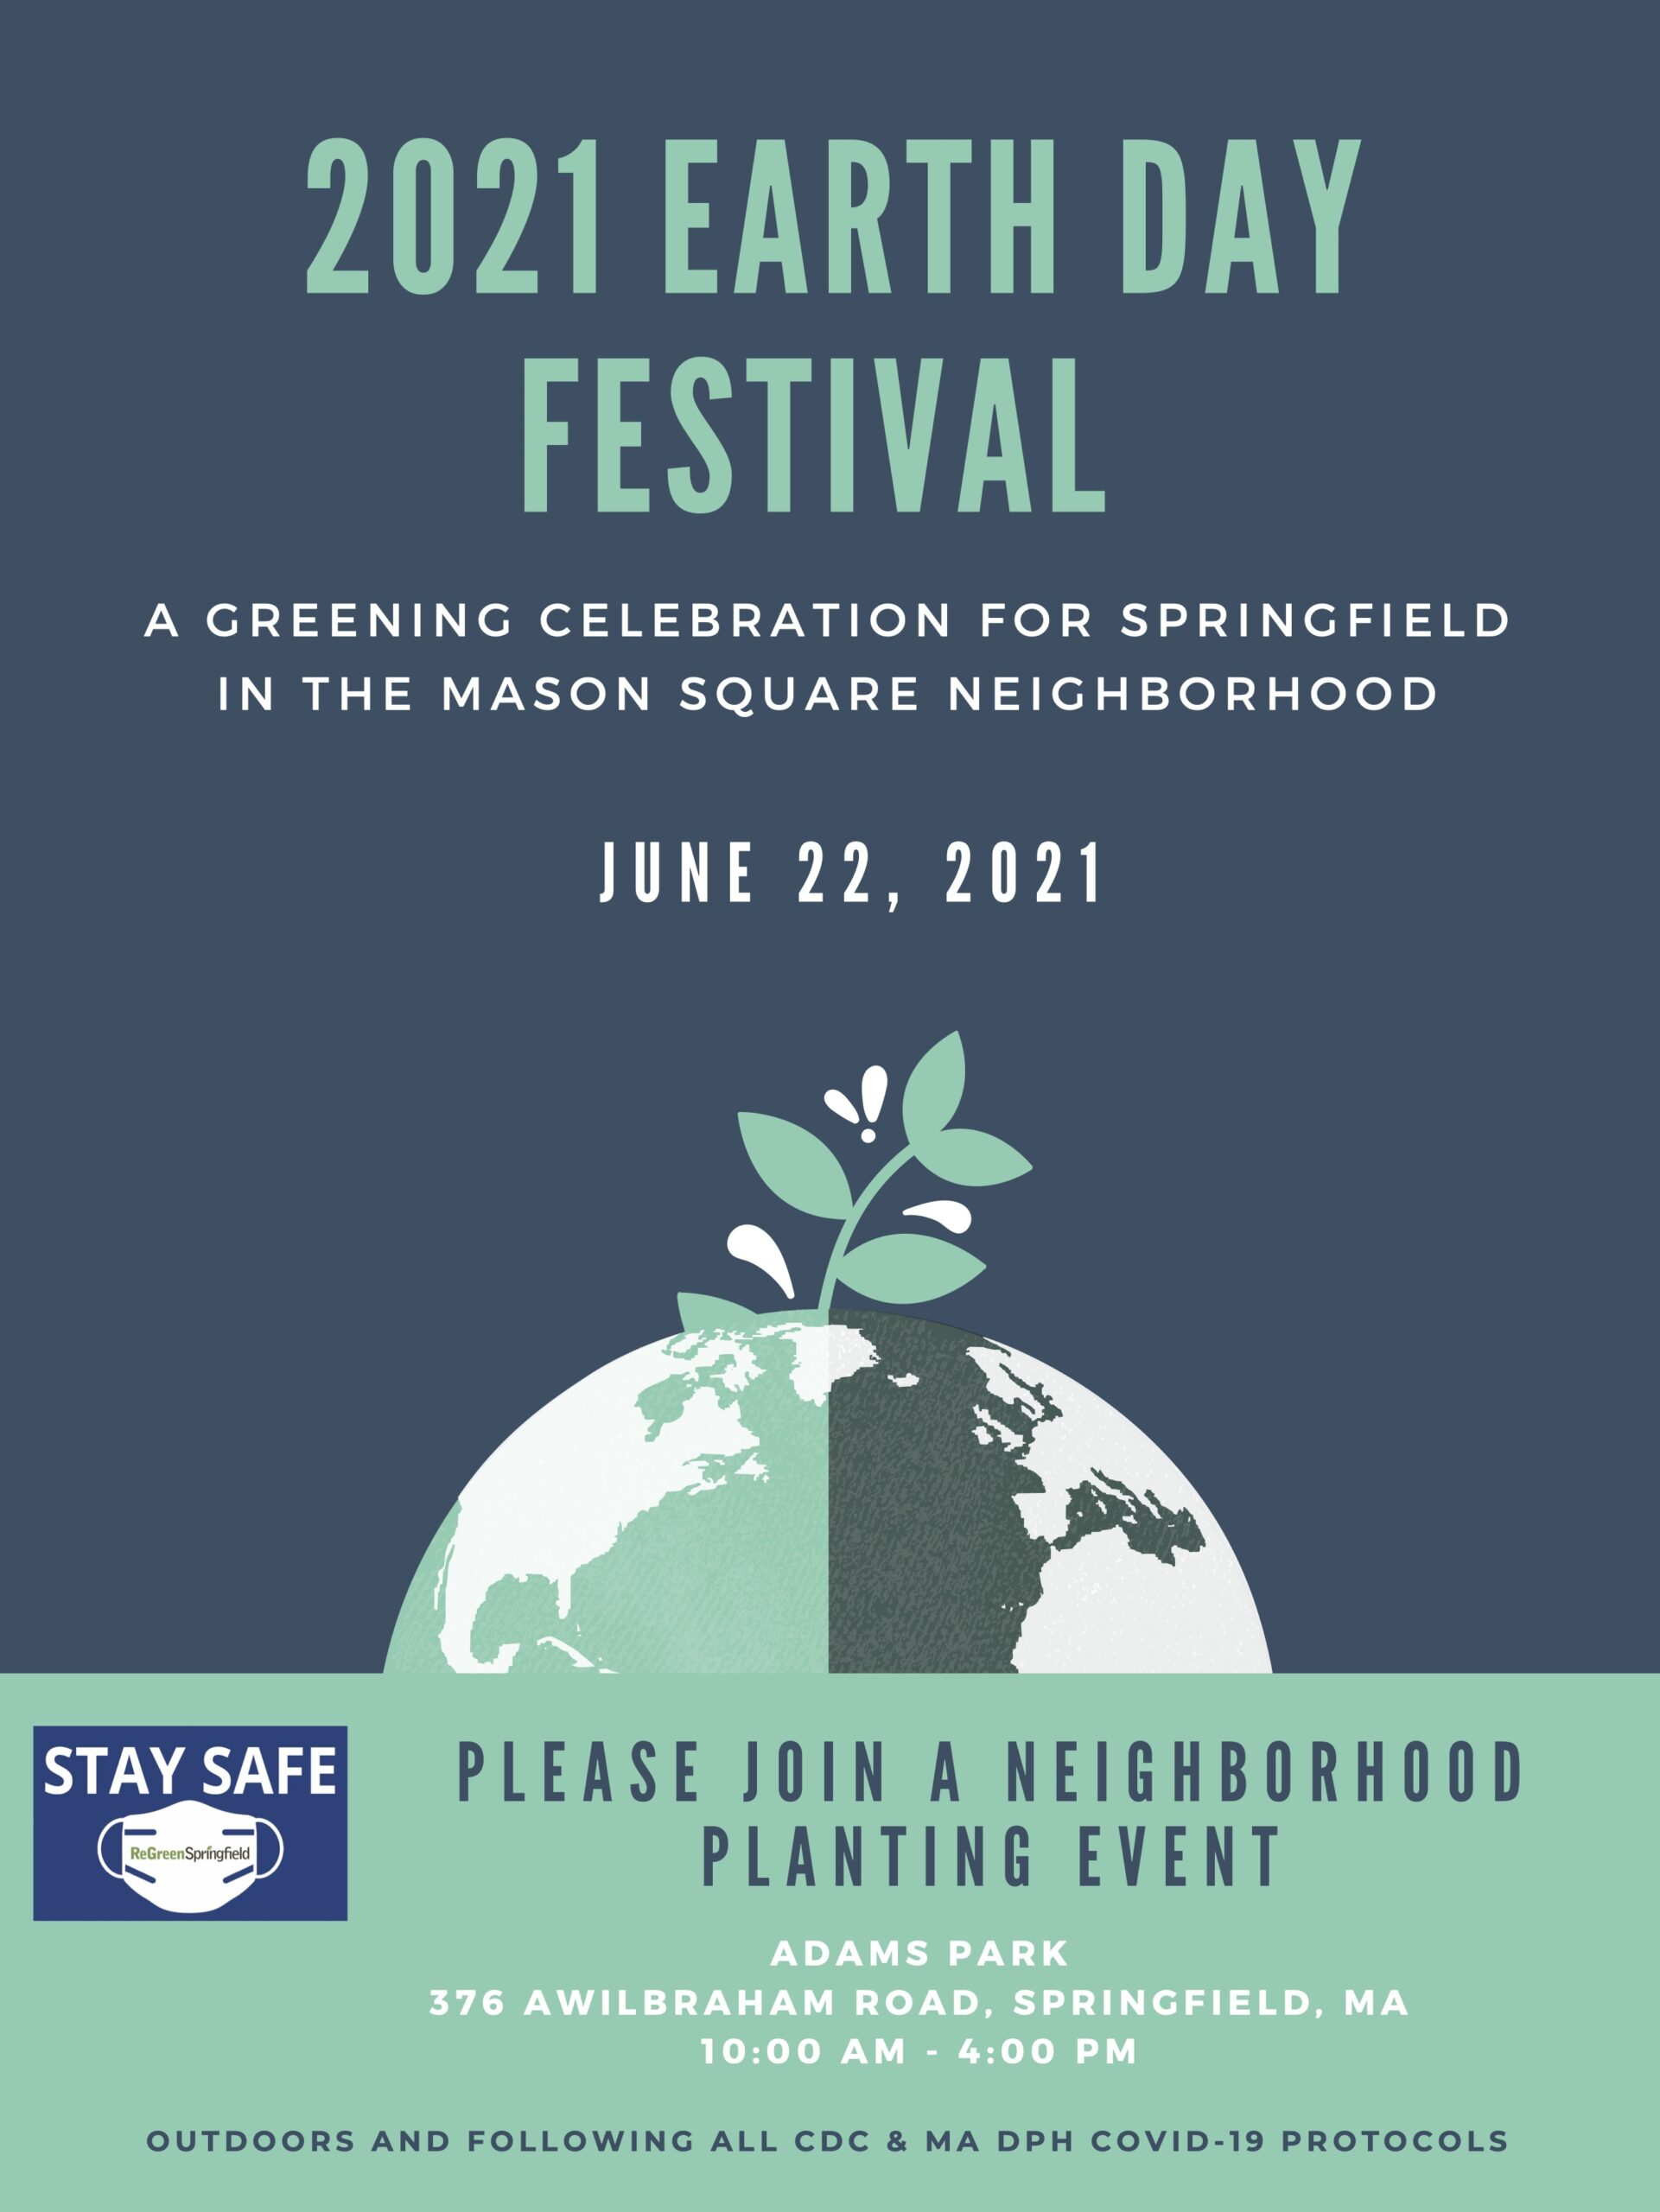 2021 Earth Day festiva;